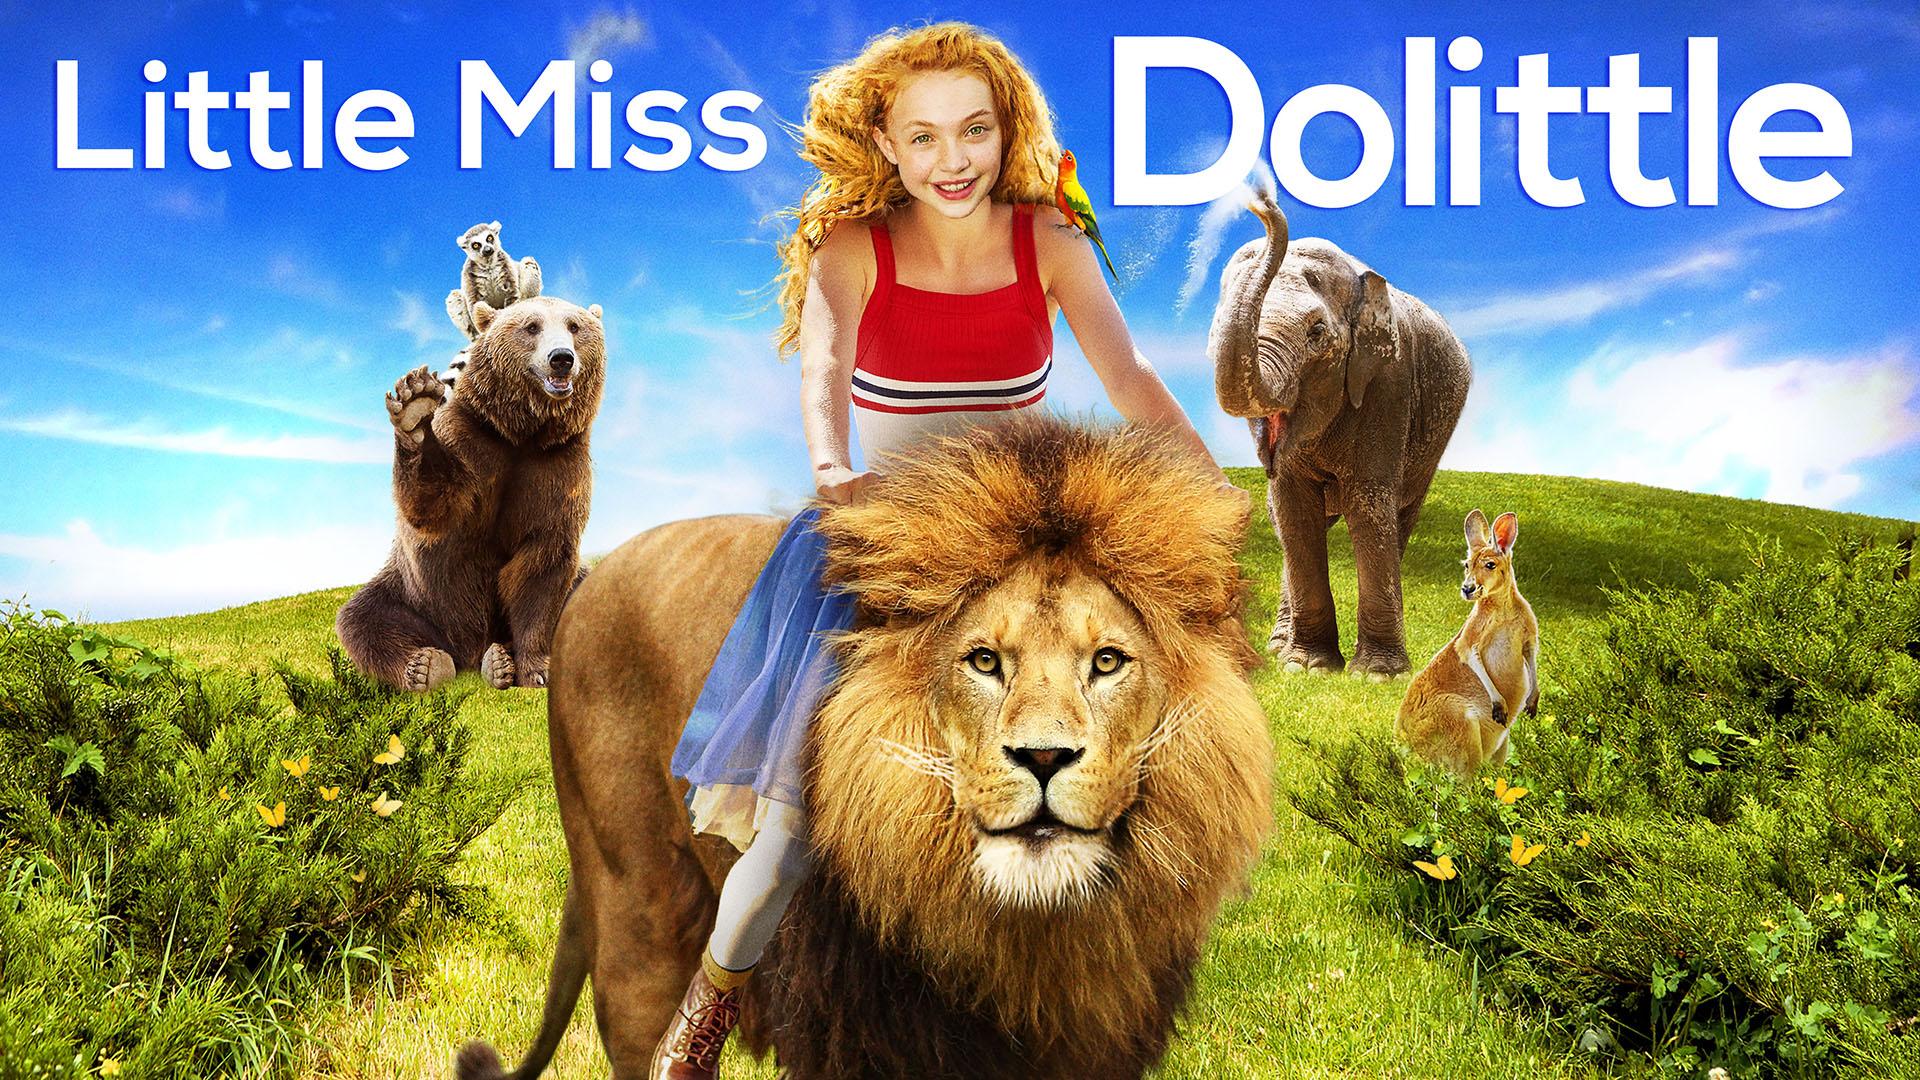 Little Miss Dolittle